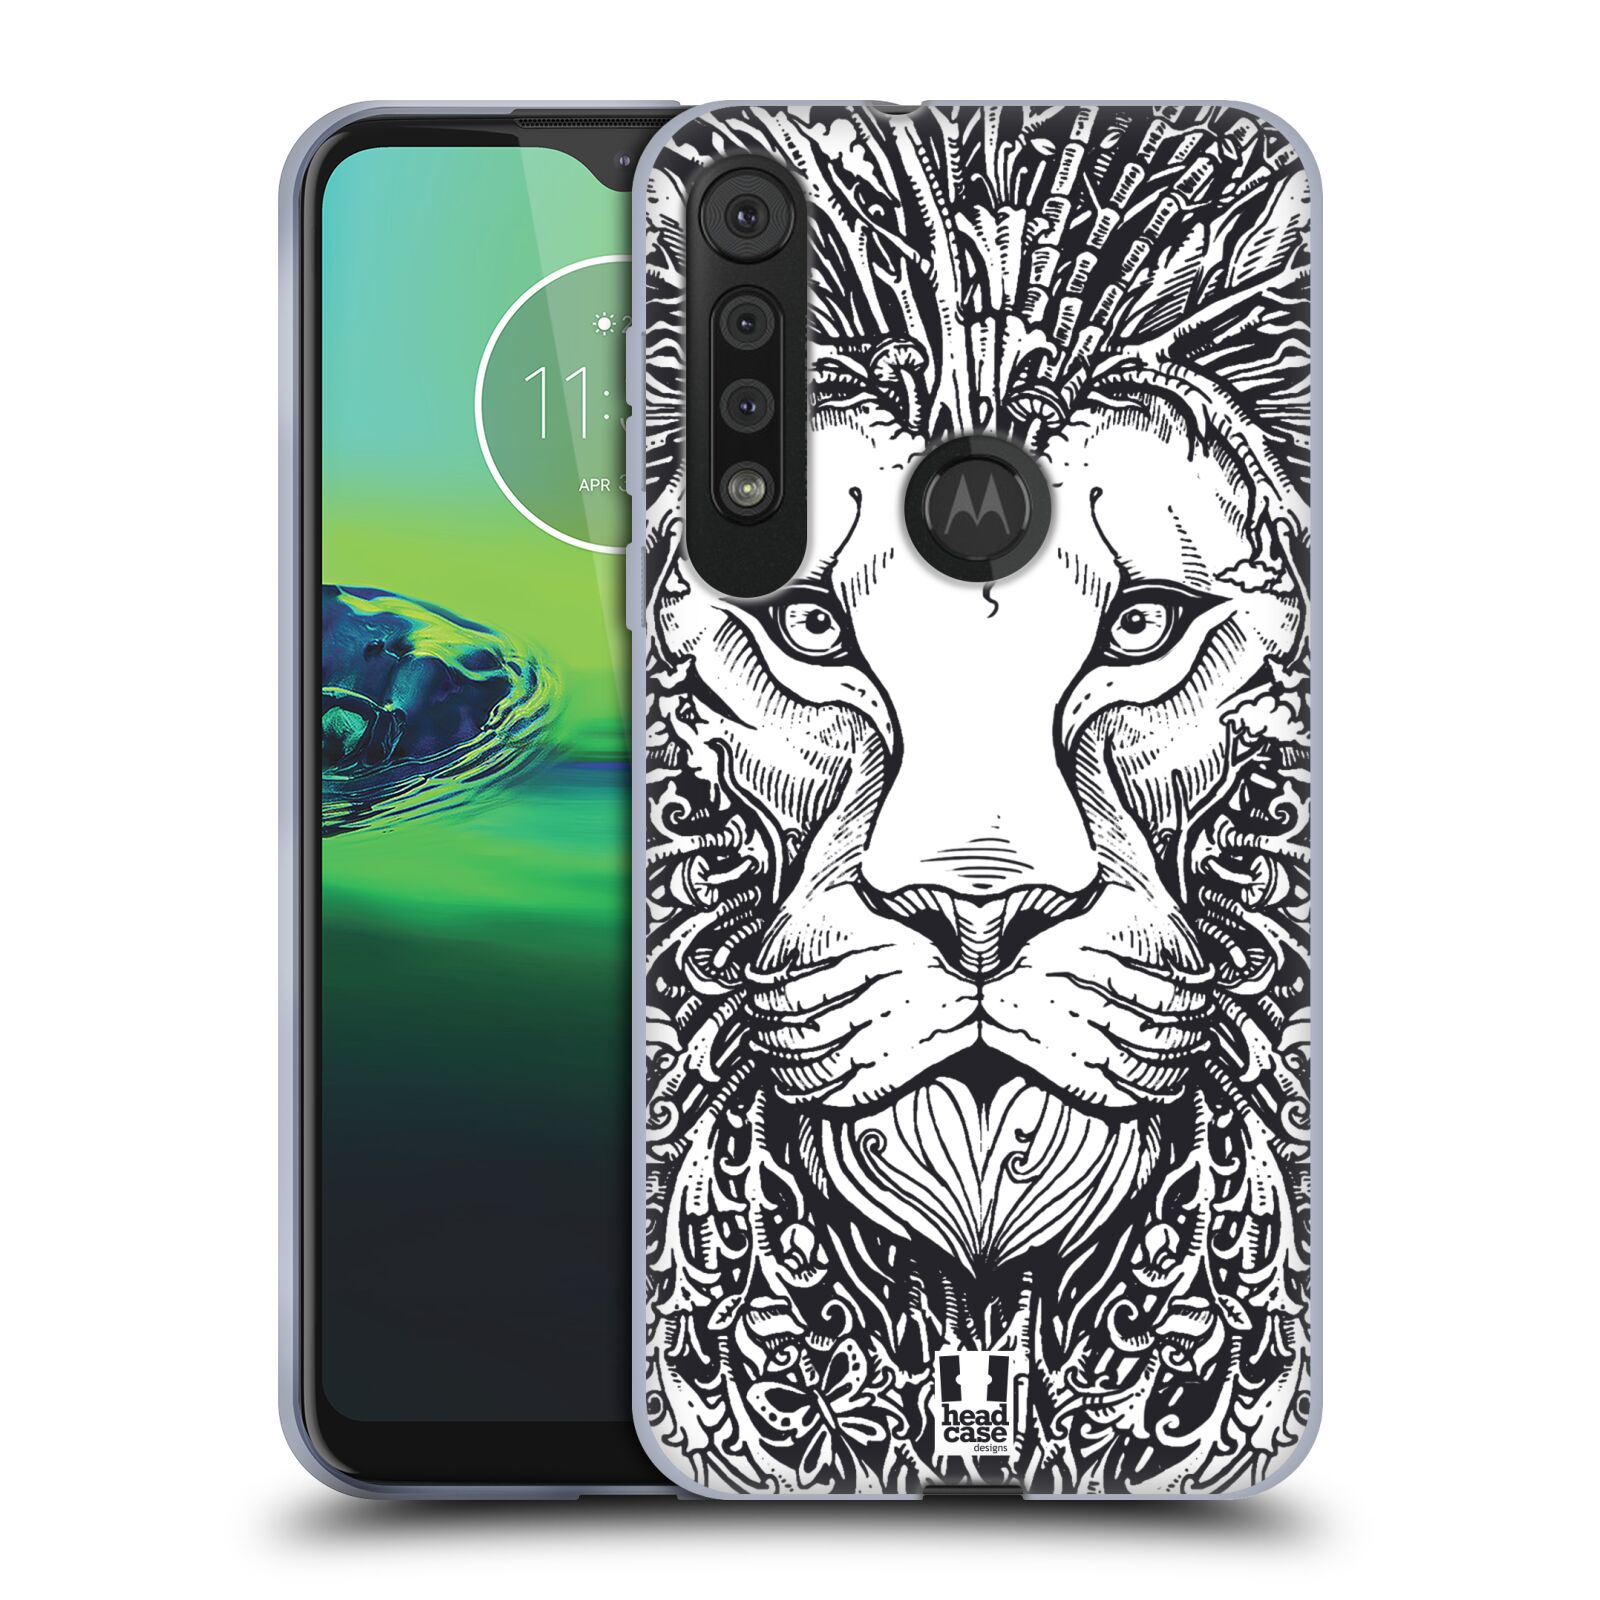 Silikonové pouzdro na mobil Motorola One Macro - Head Case - DOODLE TVÁŘ LEV